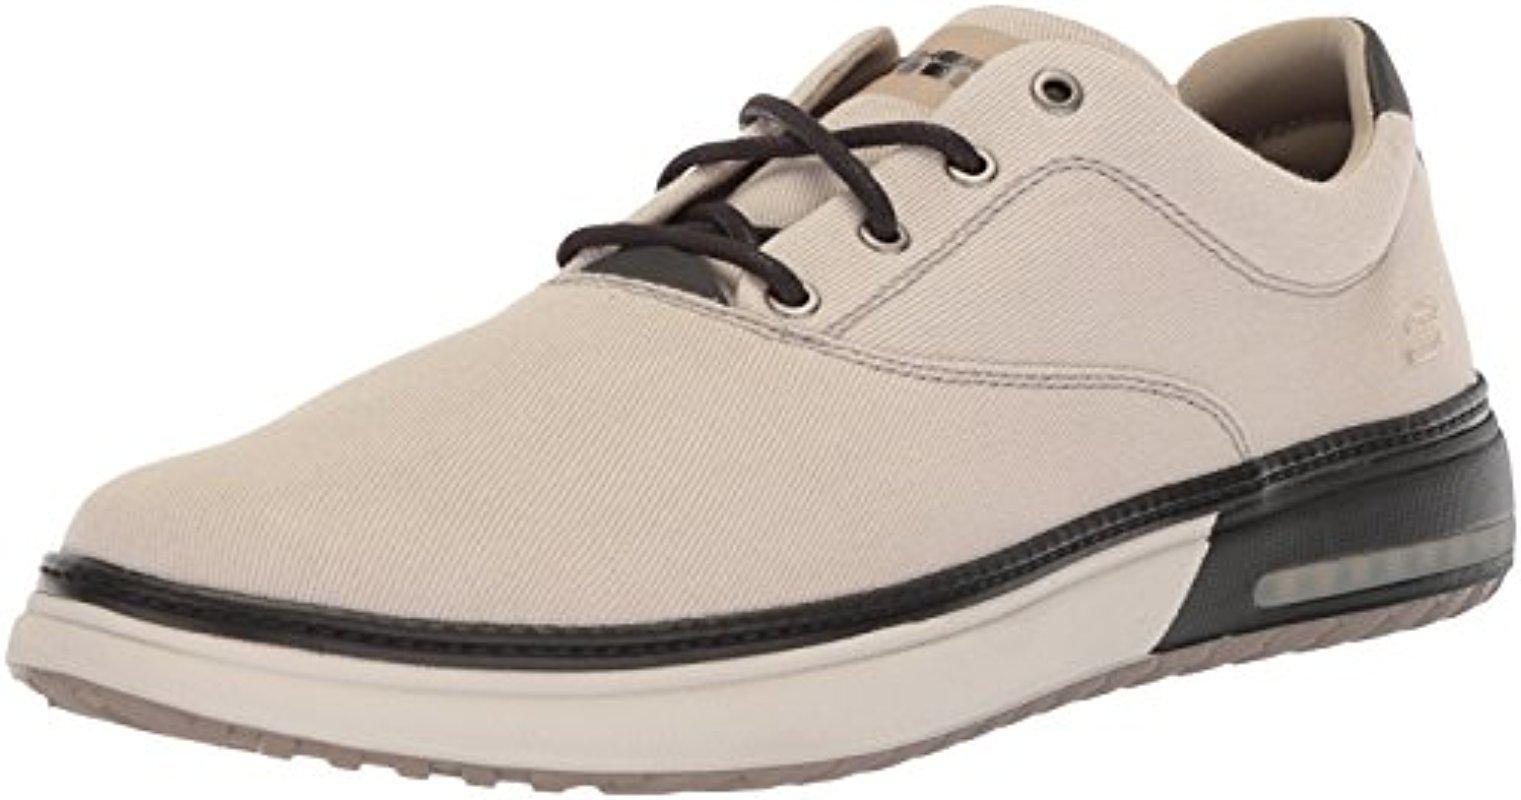 Skechers Canvas Folten-verome Boat Shoe